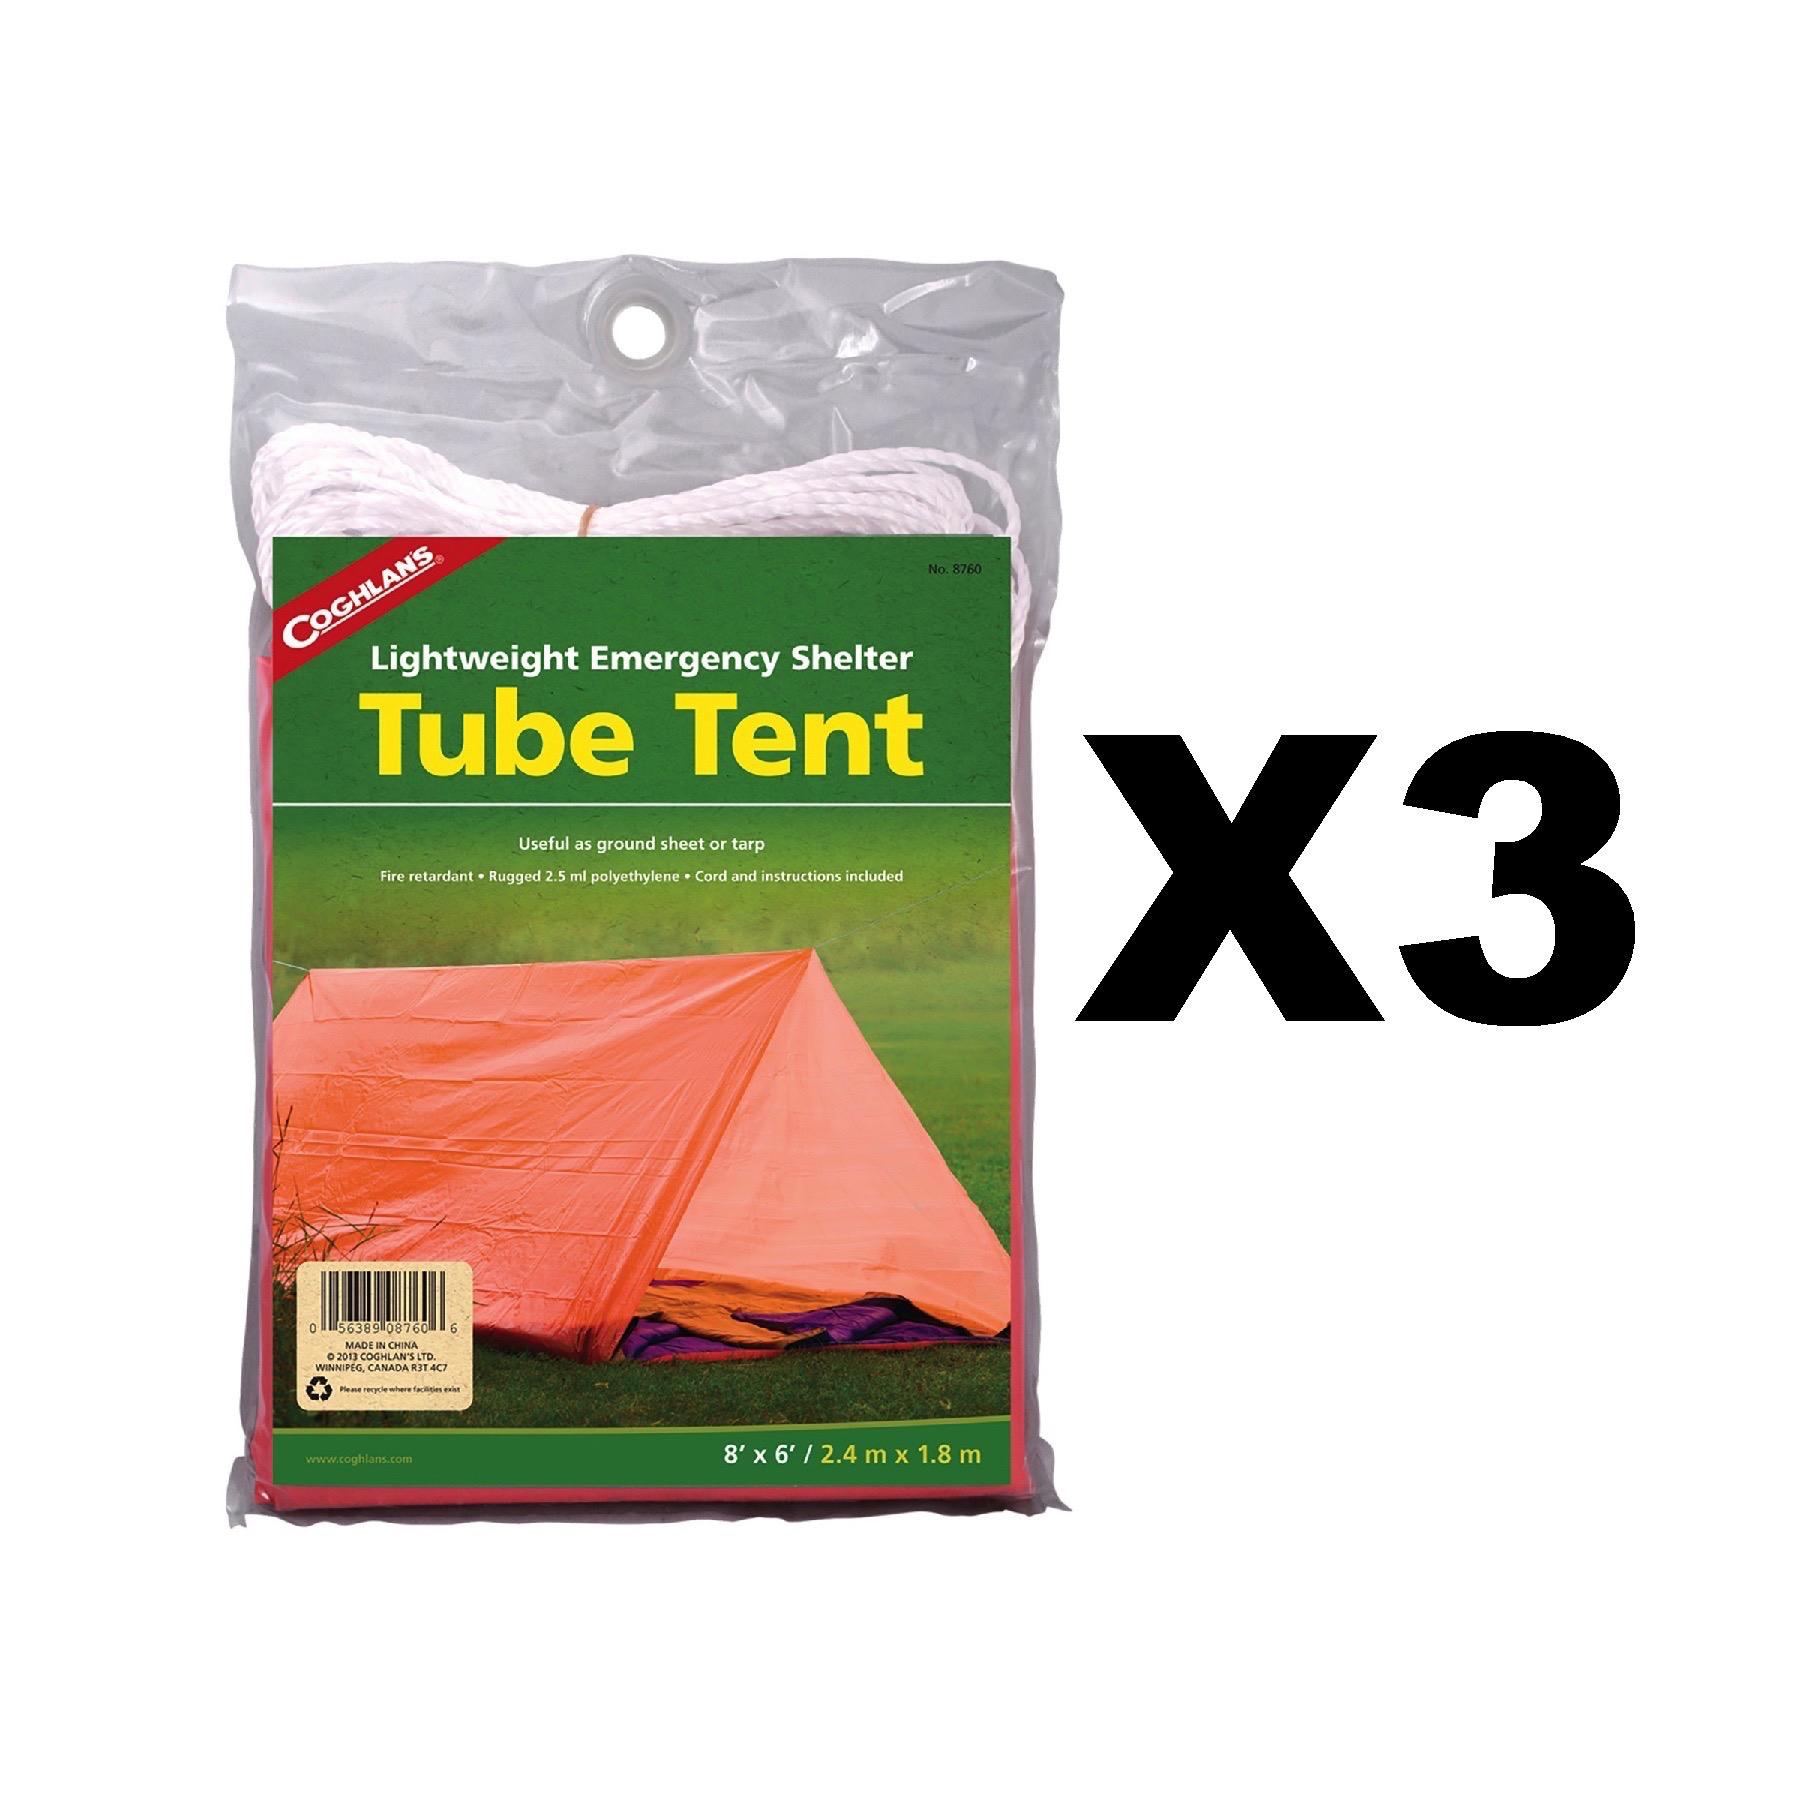 Image is loading Coghlan-039-s-Tube-Tent-Emergency-Lightweight-Polyethylene-  sc 1 st  eBay & Coghlanu0027s Tube Tent Emergency Lightweight Polyethylene Camping ...